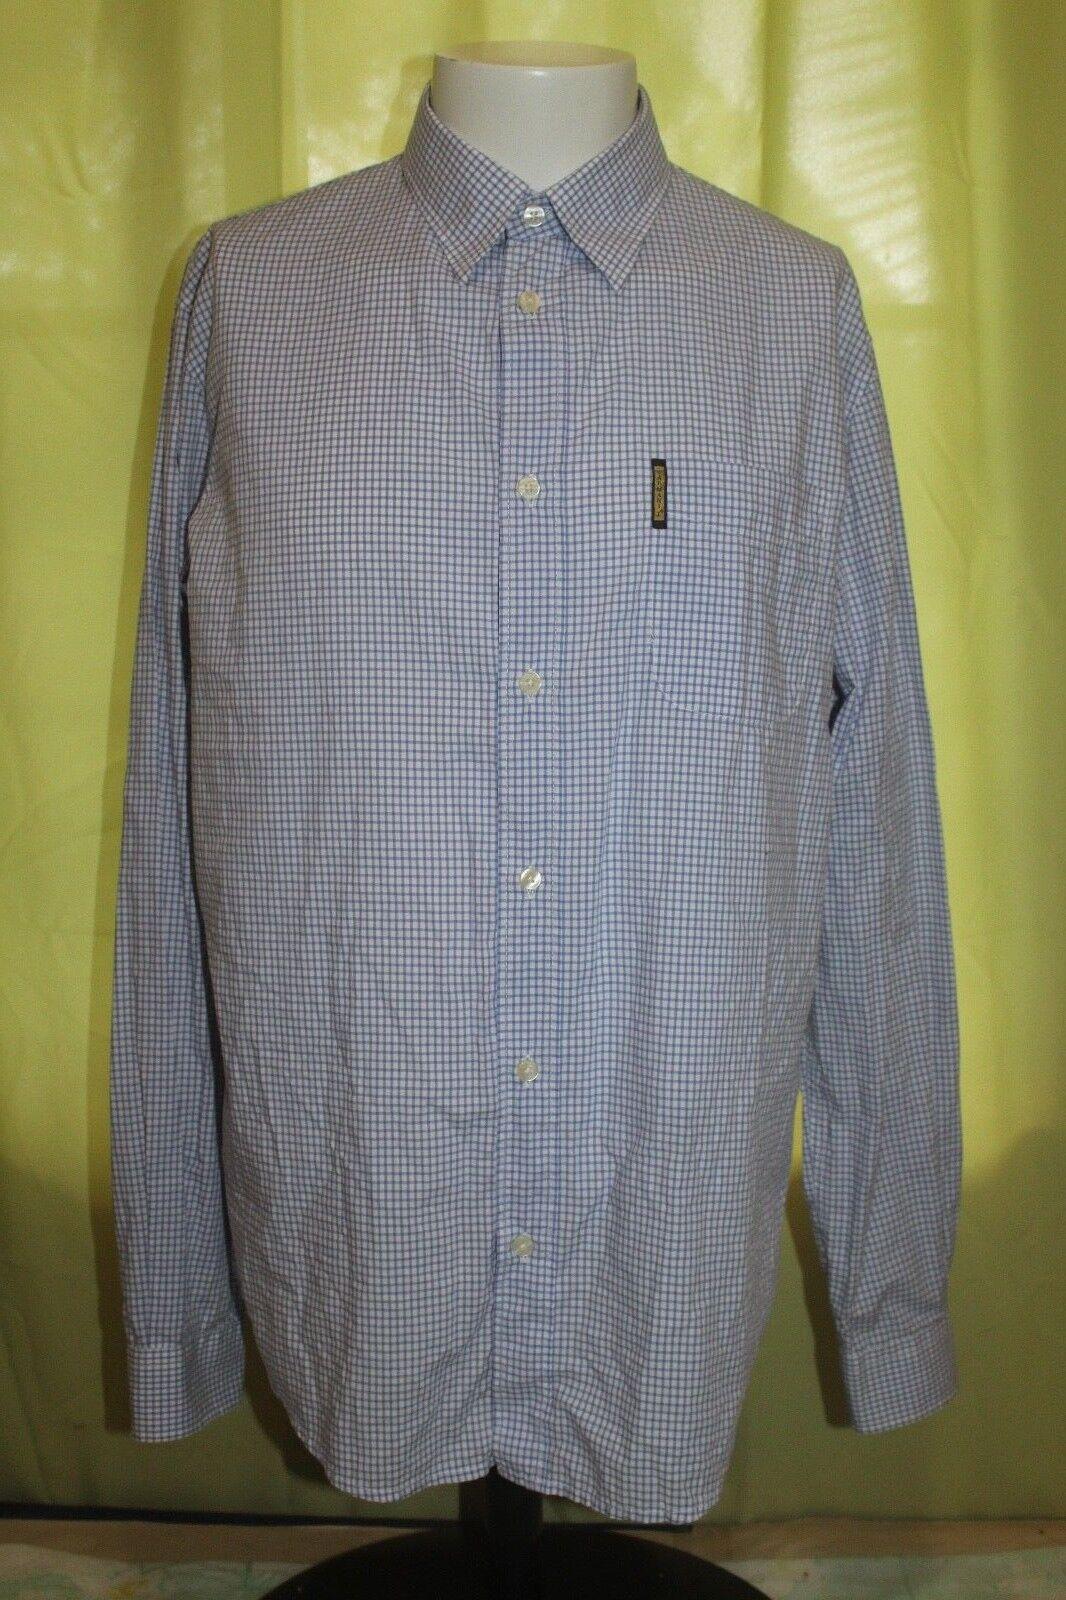 Armani Jeans männer's Blau Checks Dress hemd Größe XL RN 103723